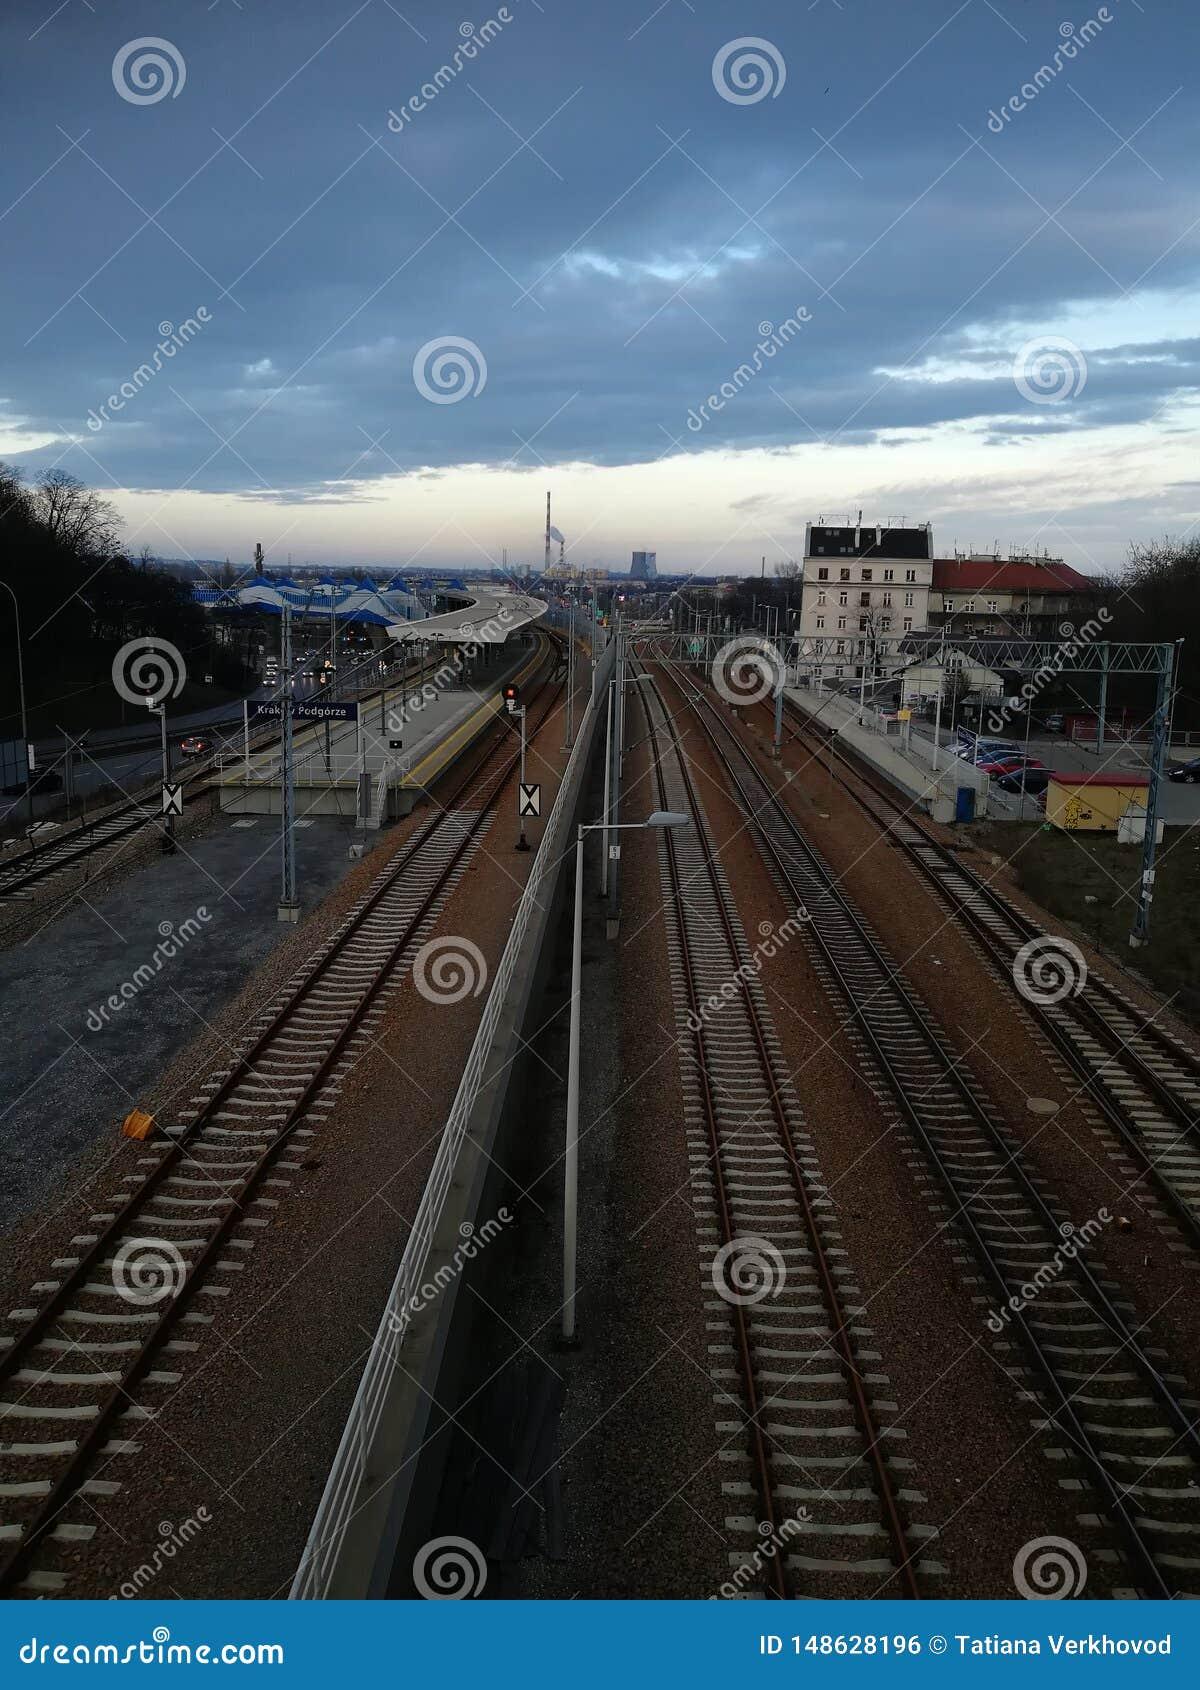 Railway tracks in Krakow